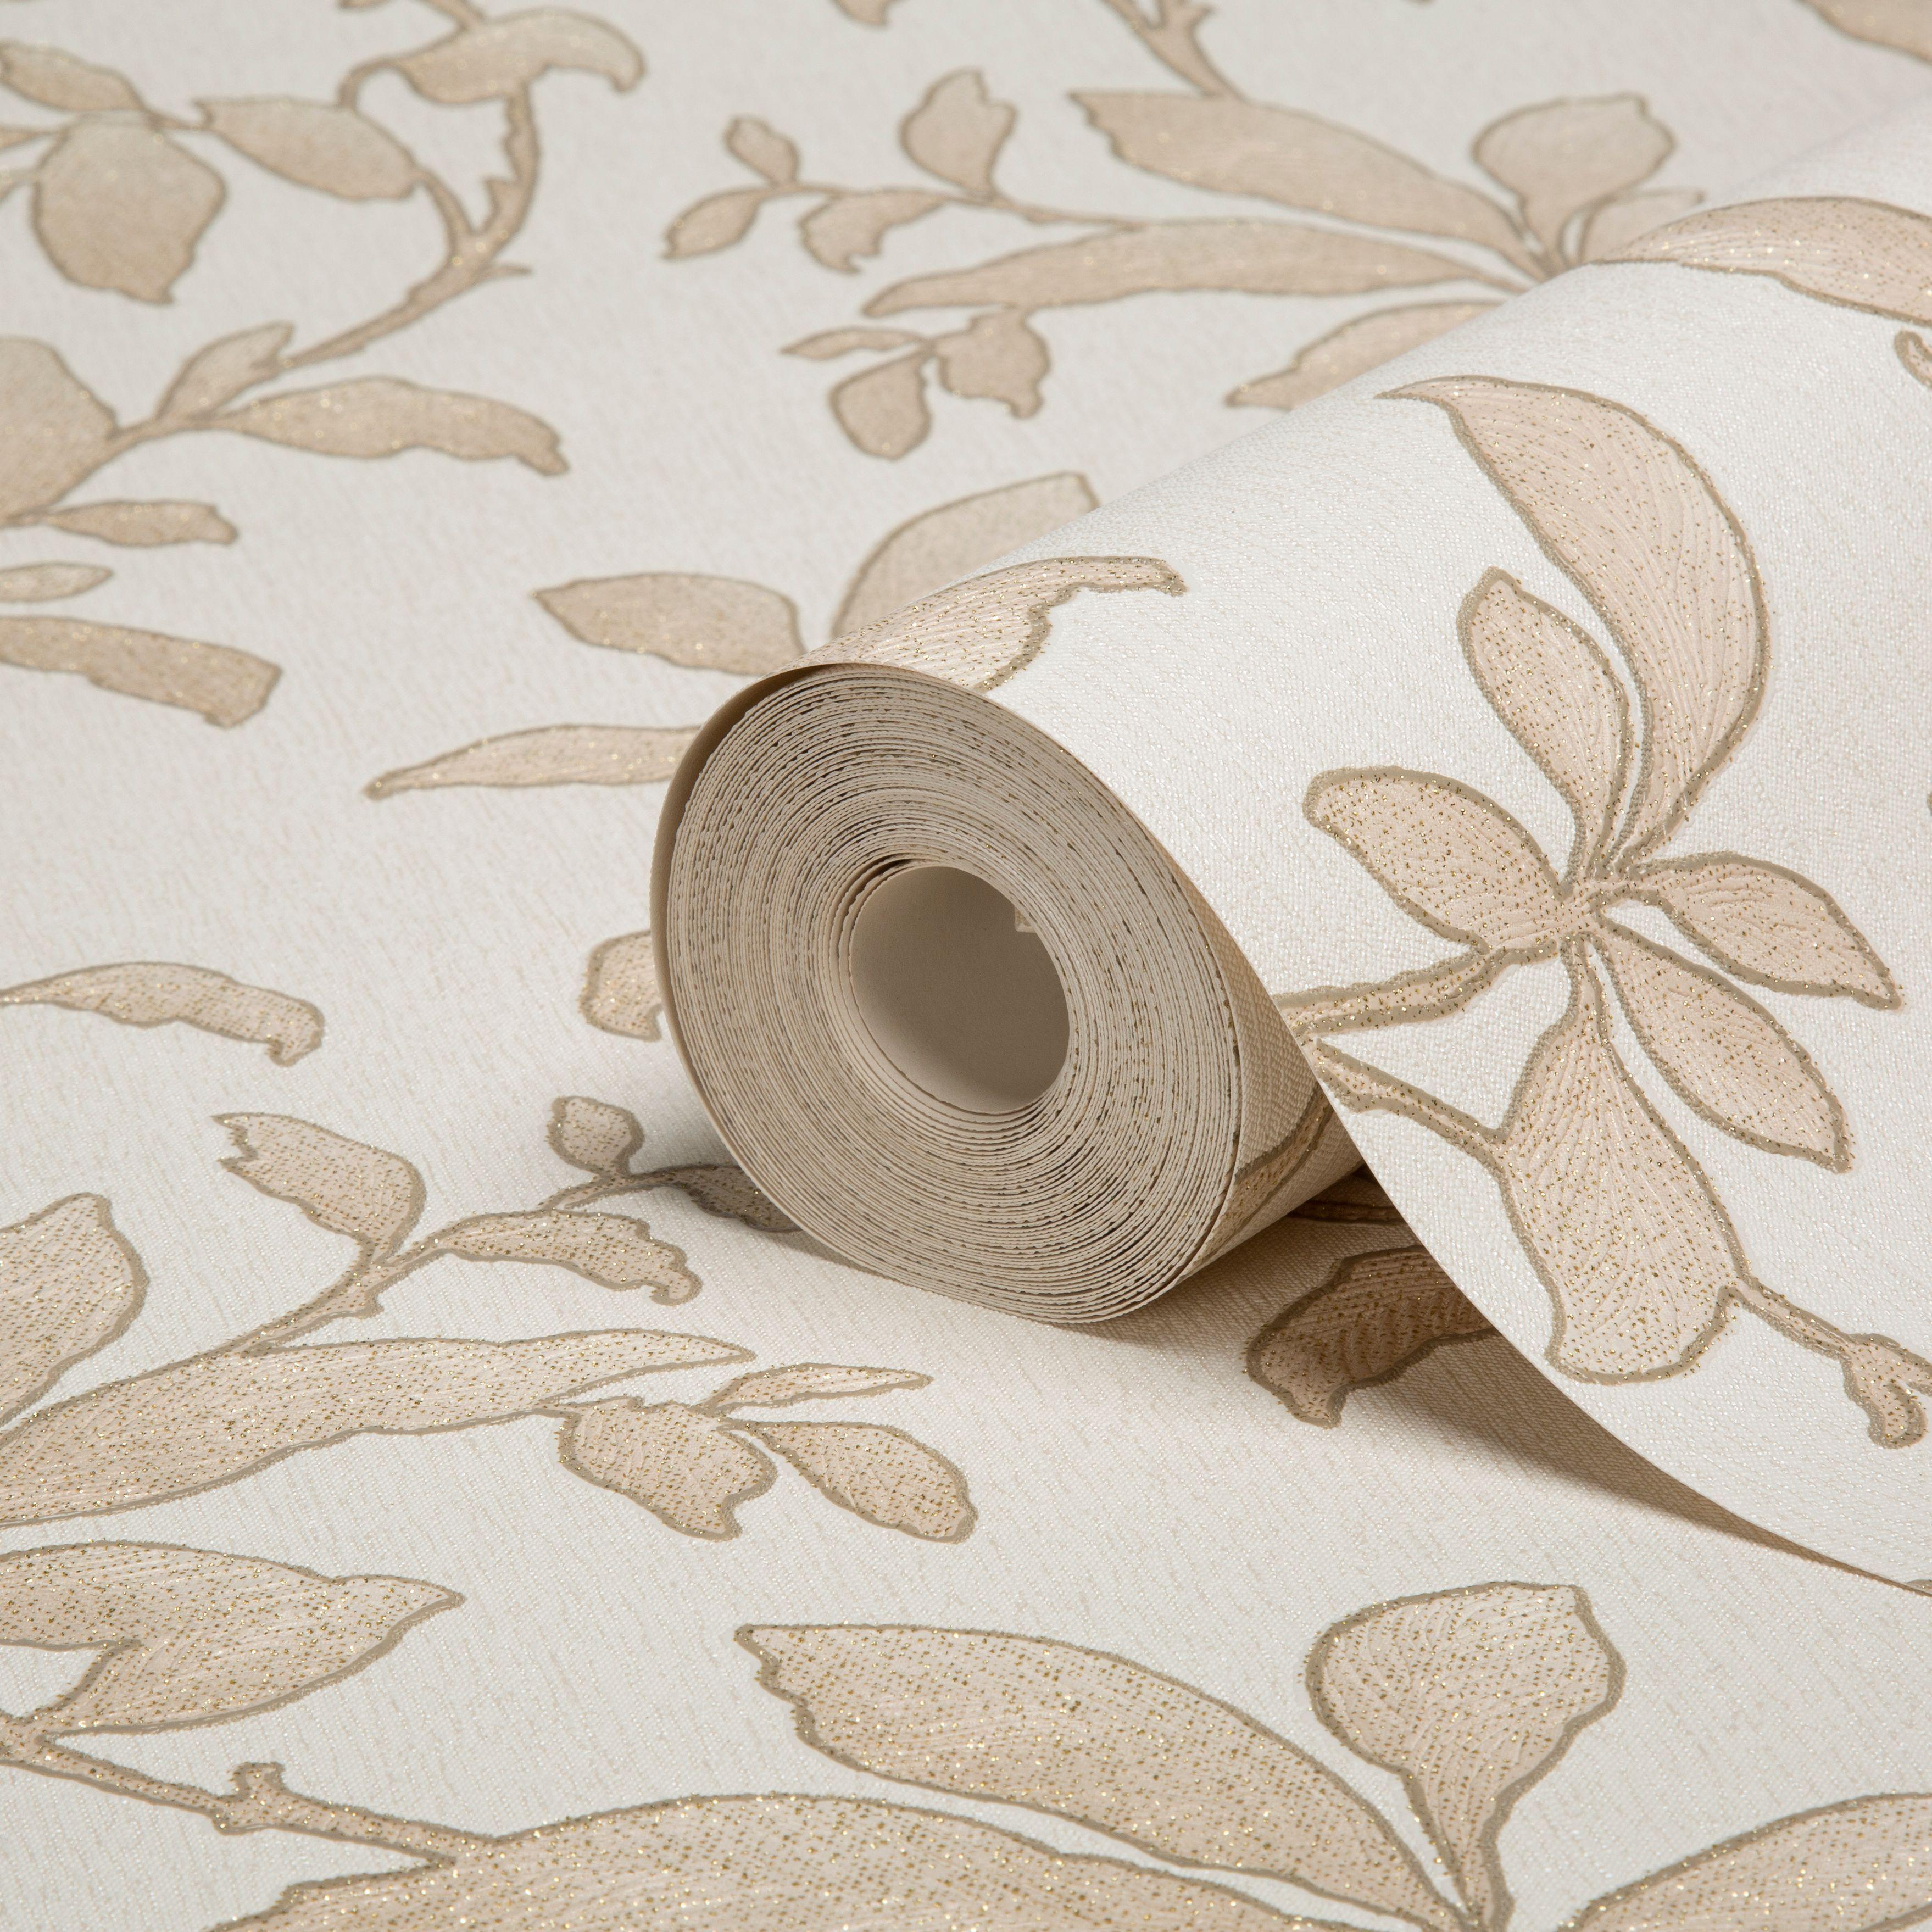 Sarra Leaves Gold Effect Wallpaper Departments DIY at